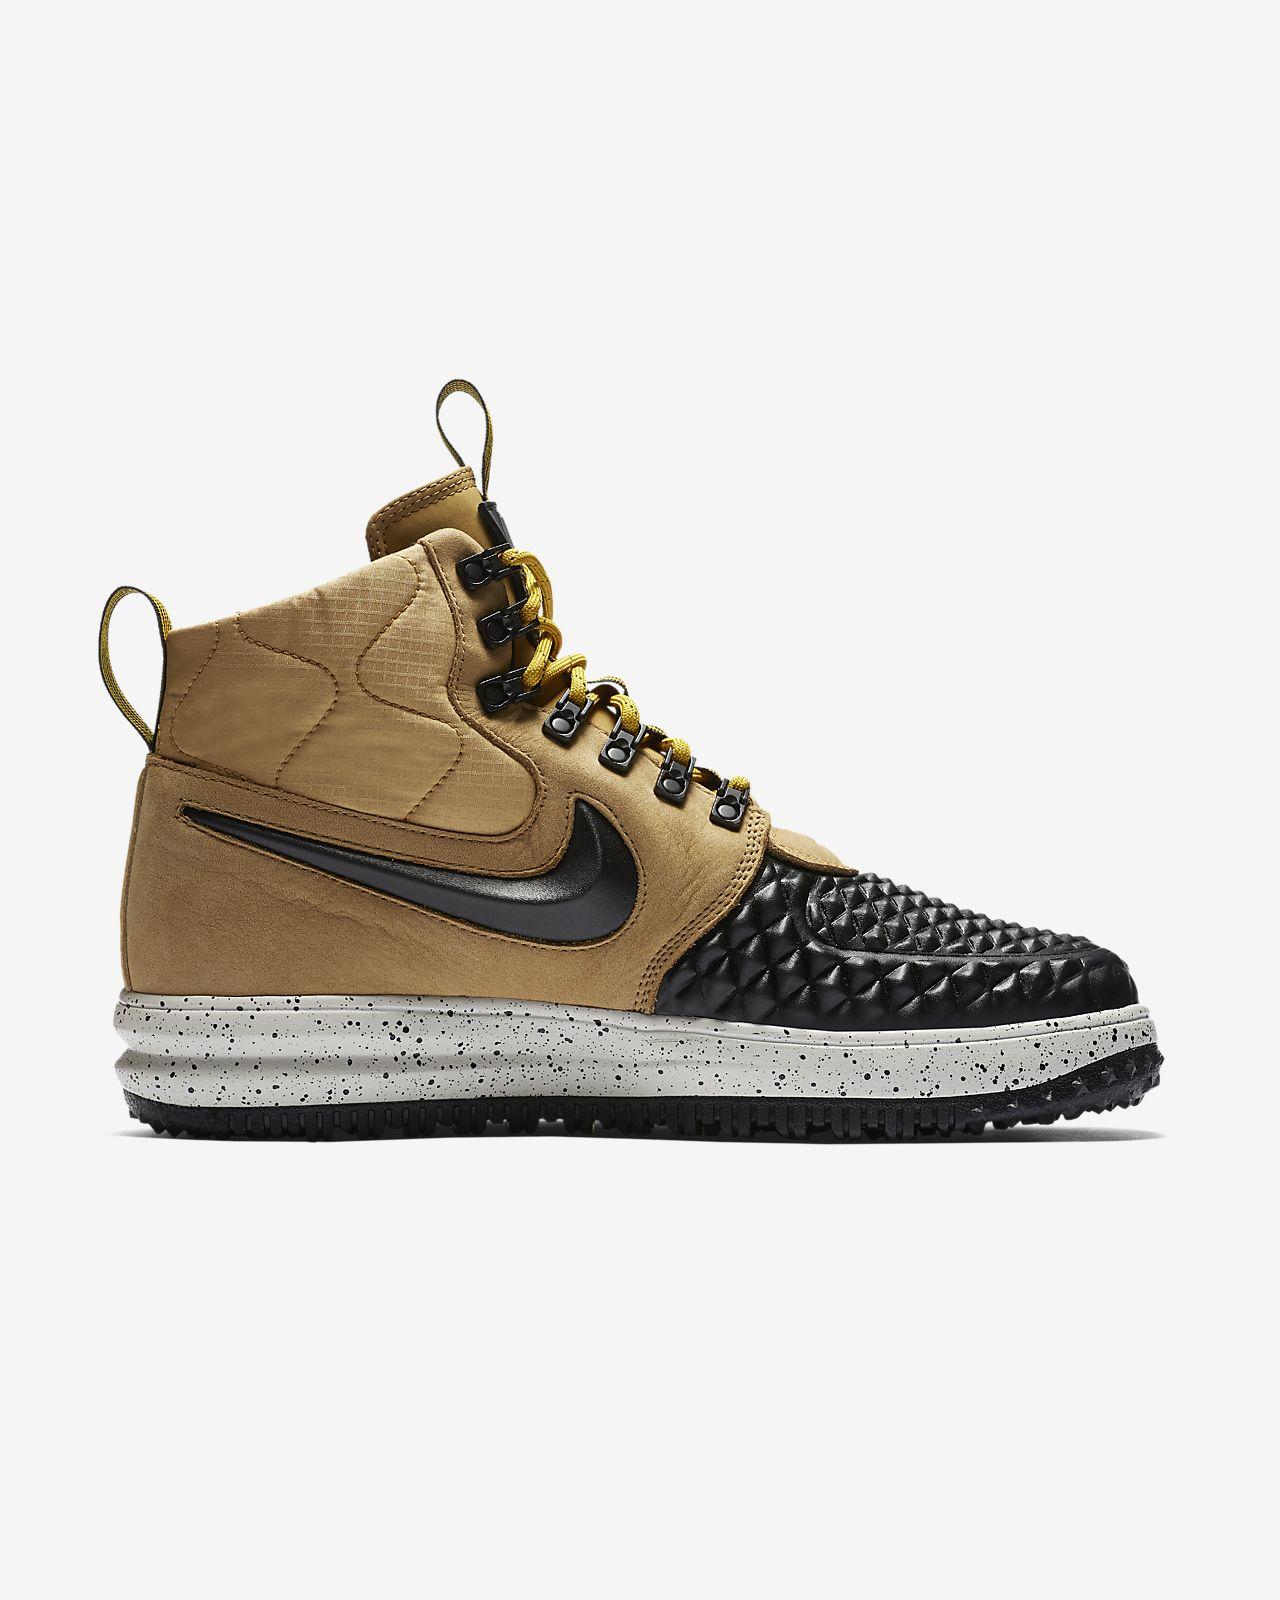 ... Nike Lunar Force 1 Duckboot '17 Men's Boot